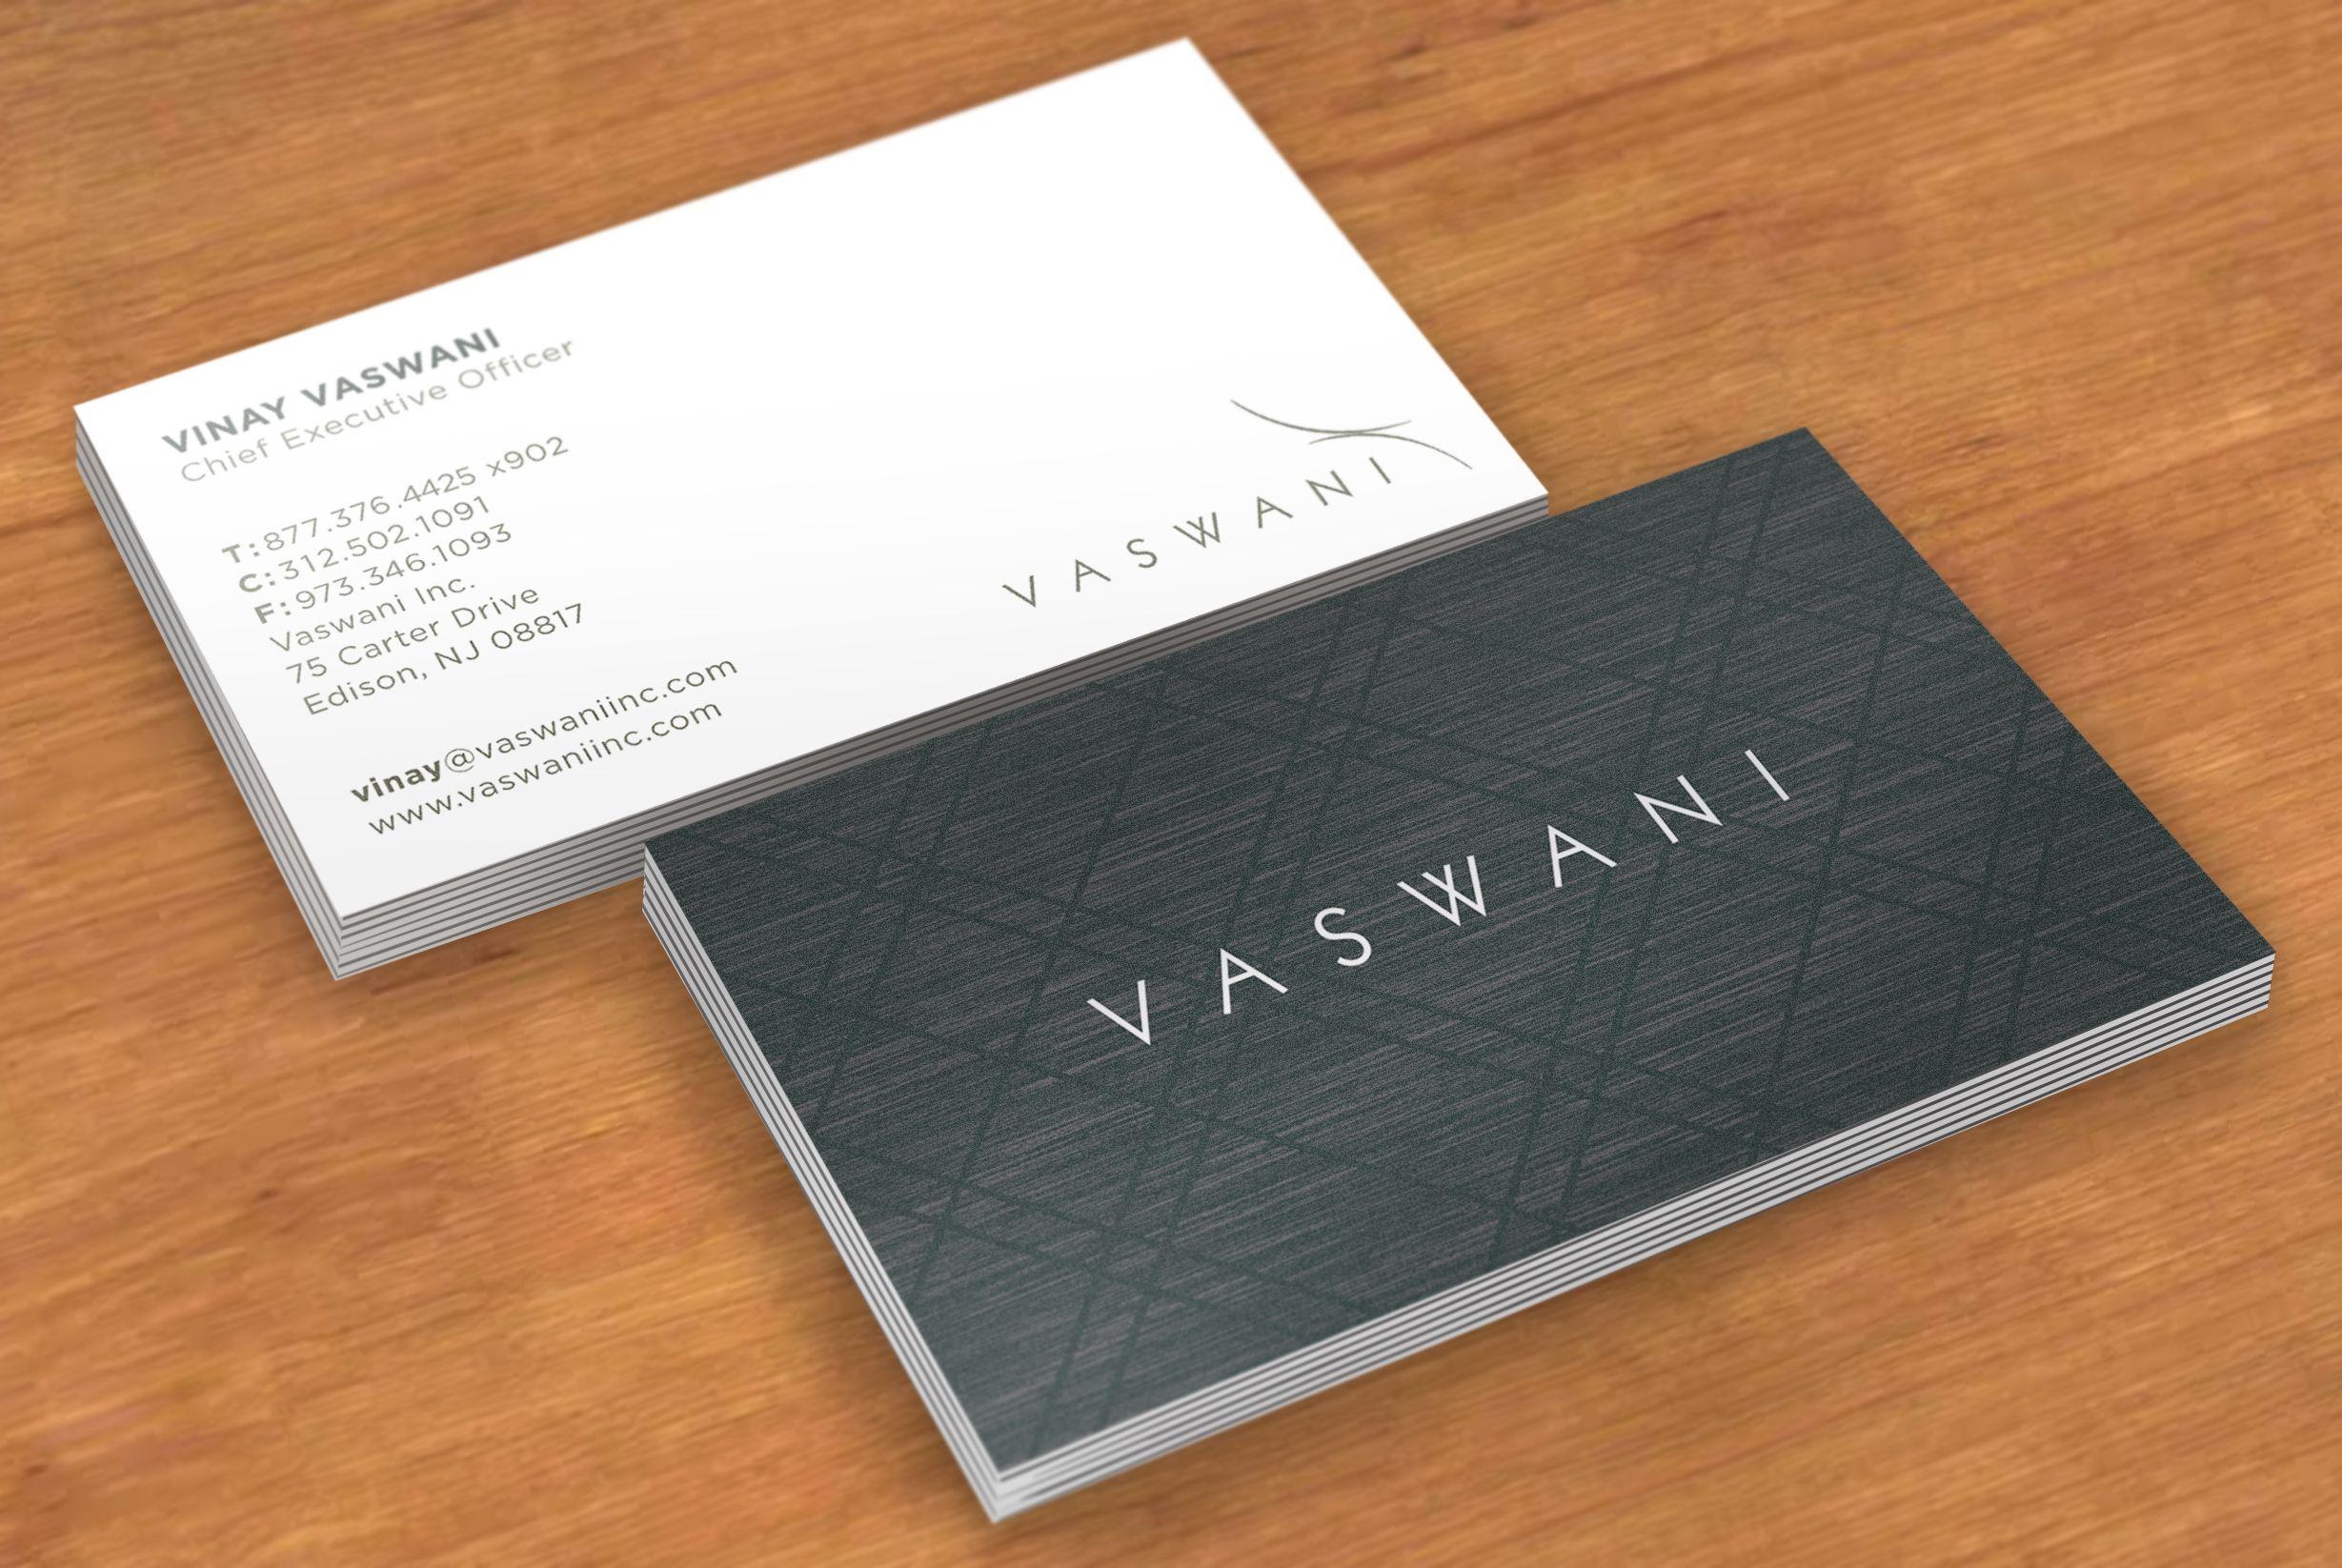 Design Visitenkarten Online Kanada In Verbindung Mit Design